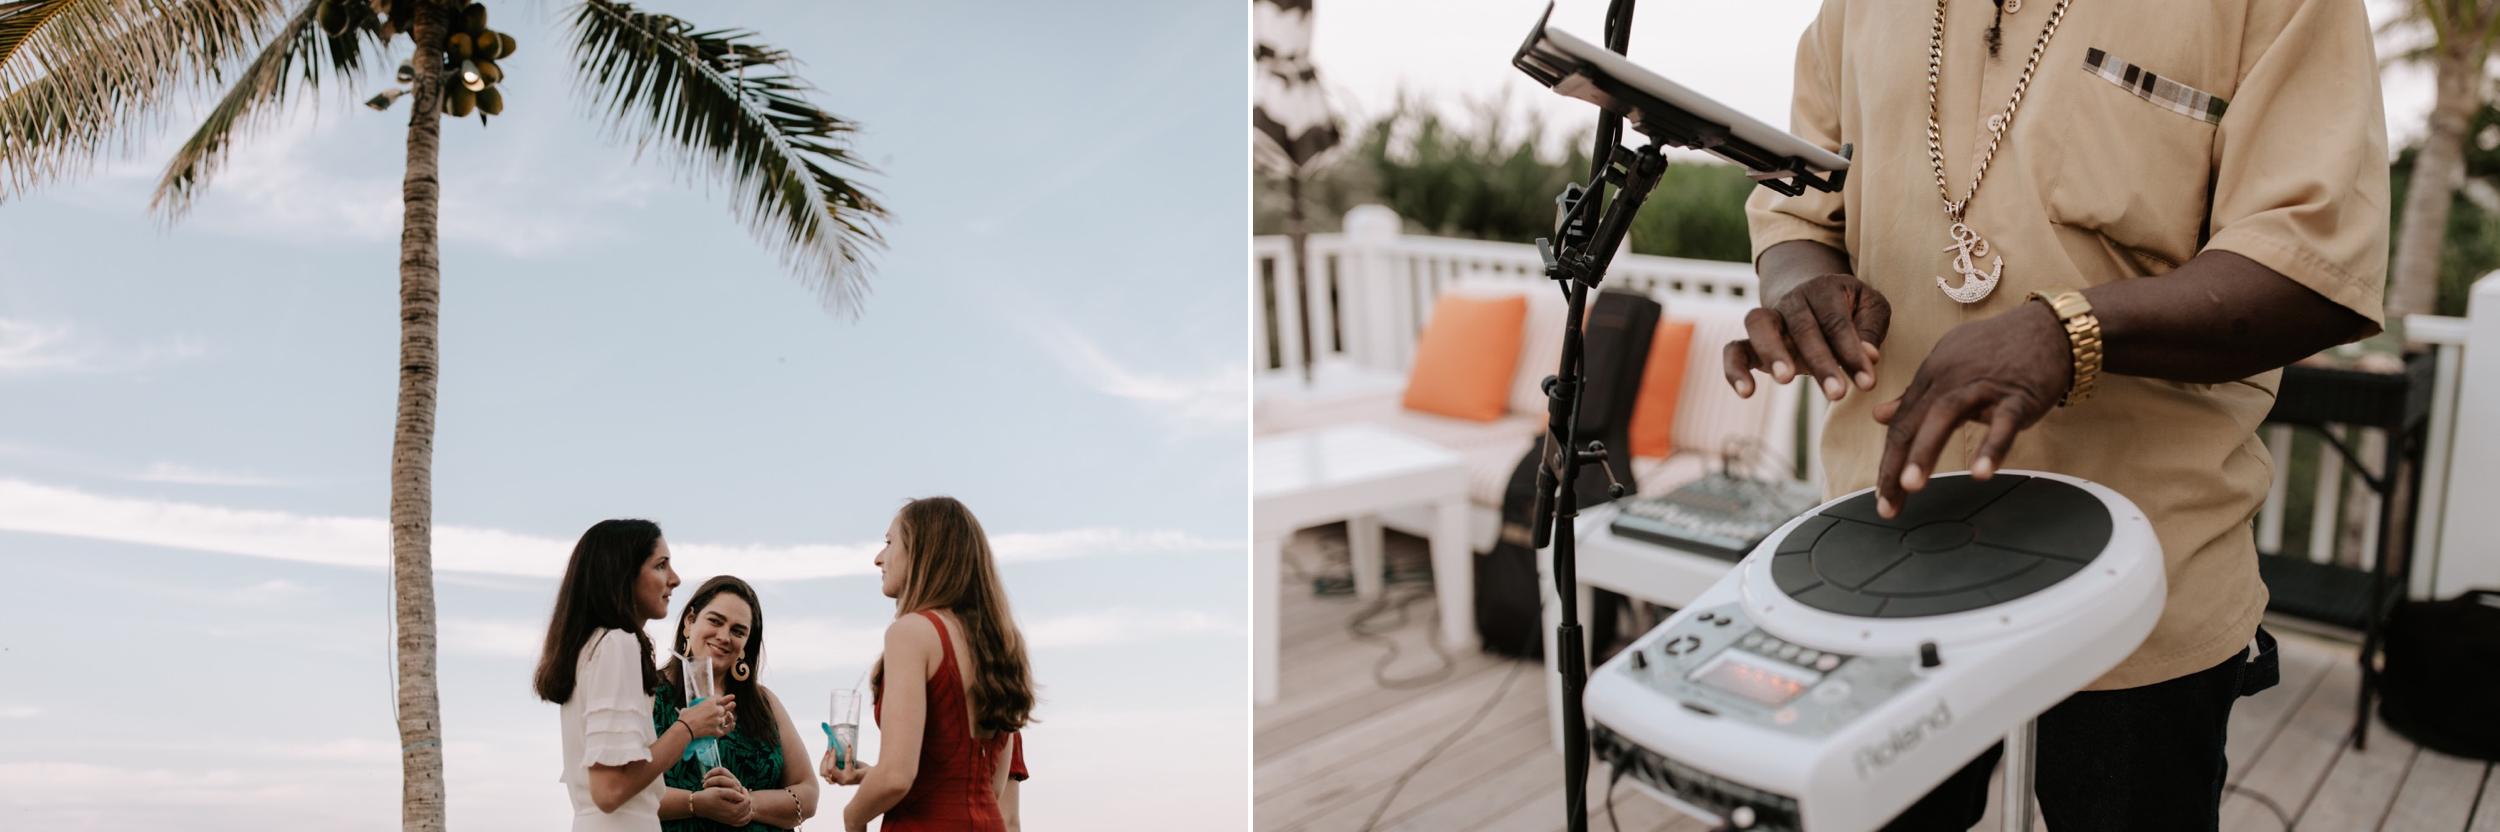 Harbour-Island-Ocean-View-Club-Wedding-Photographer_25.jpg